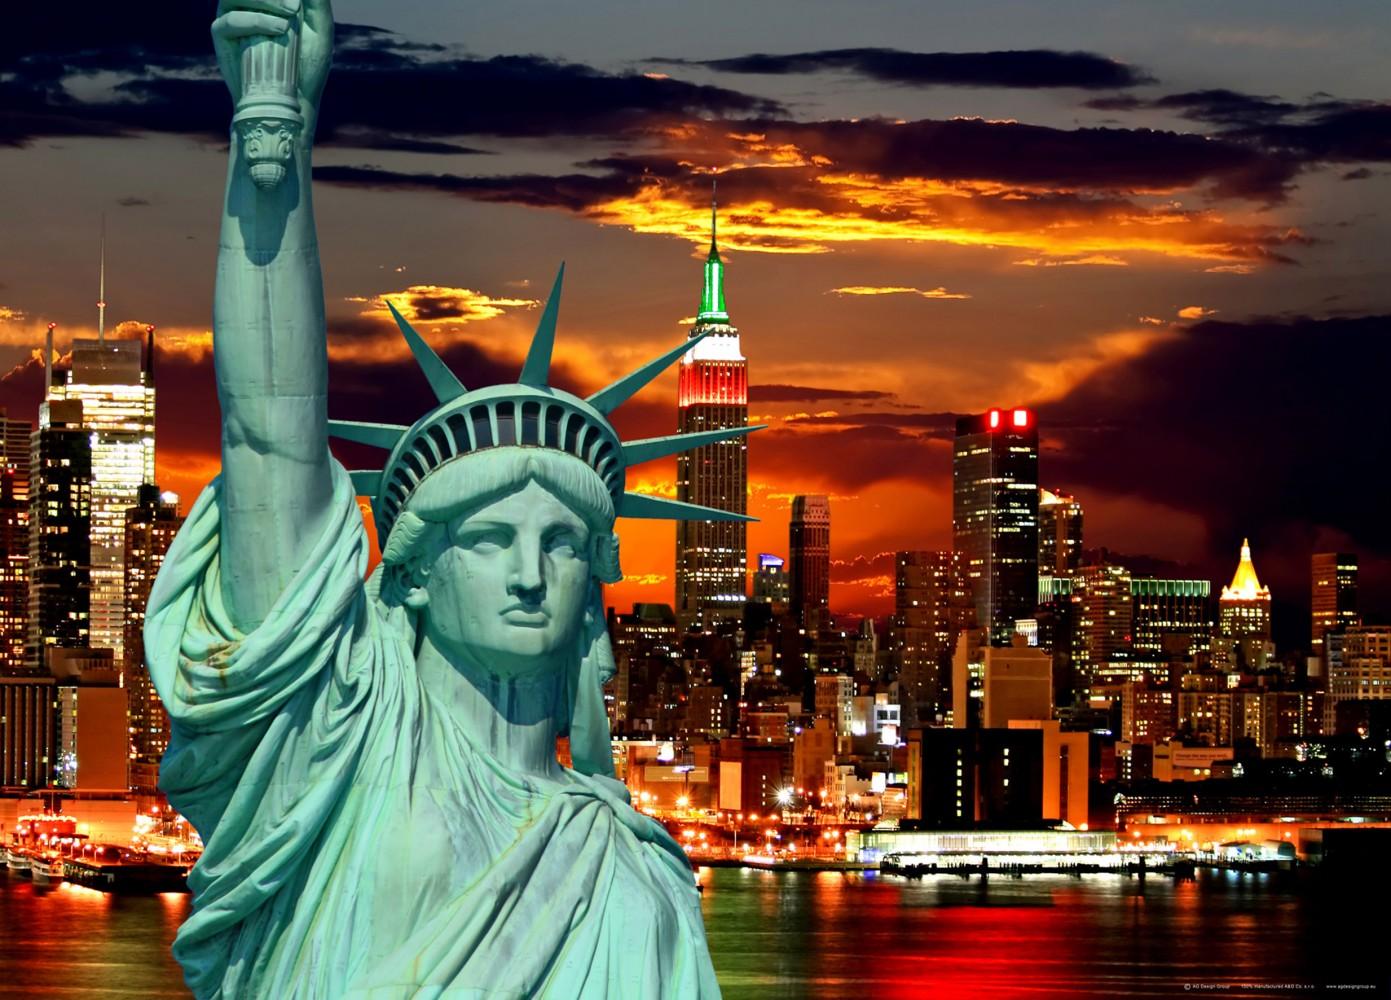 xxl poster fototapete tapete freiheitsstatue new york skyline foto 160 x 115 cm. Black Bedroom Furniture Sets. Home Design Ideas